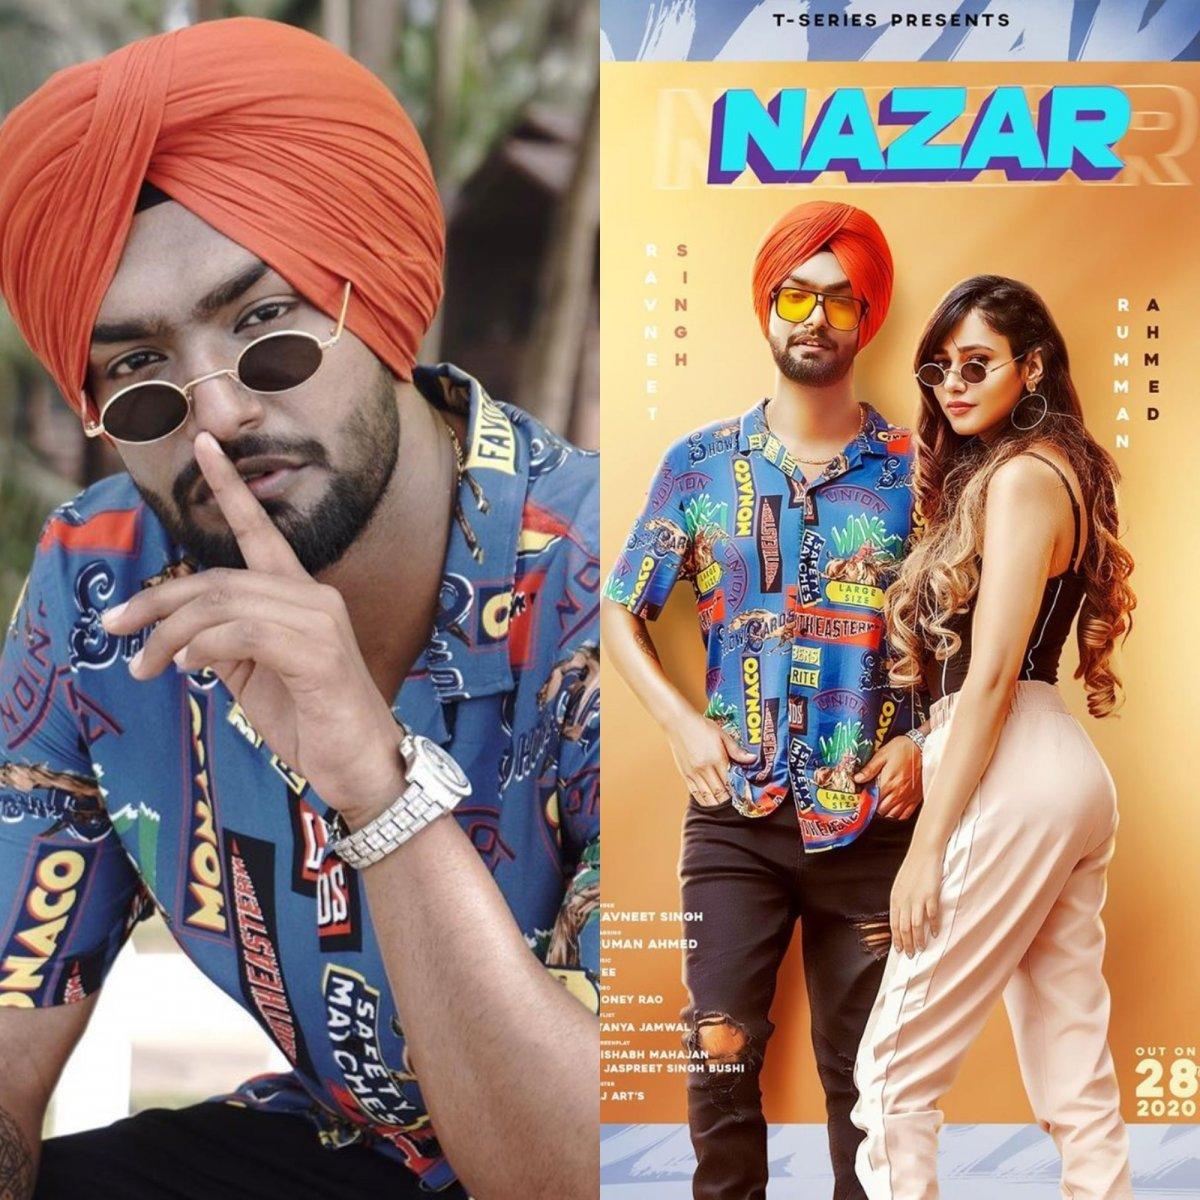 Nazar song from Ravneet Singh